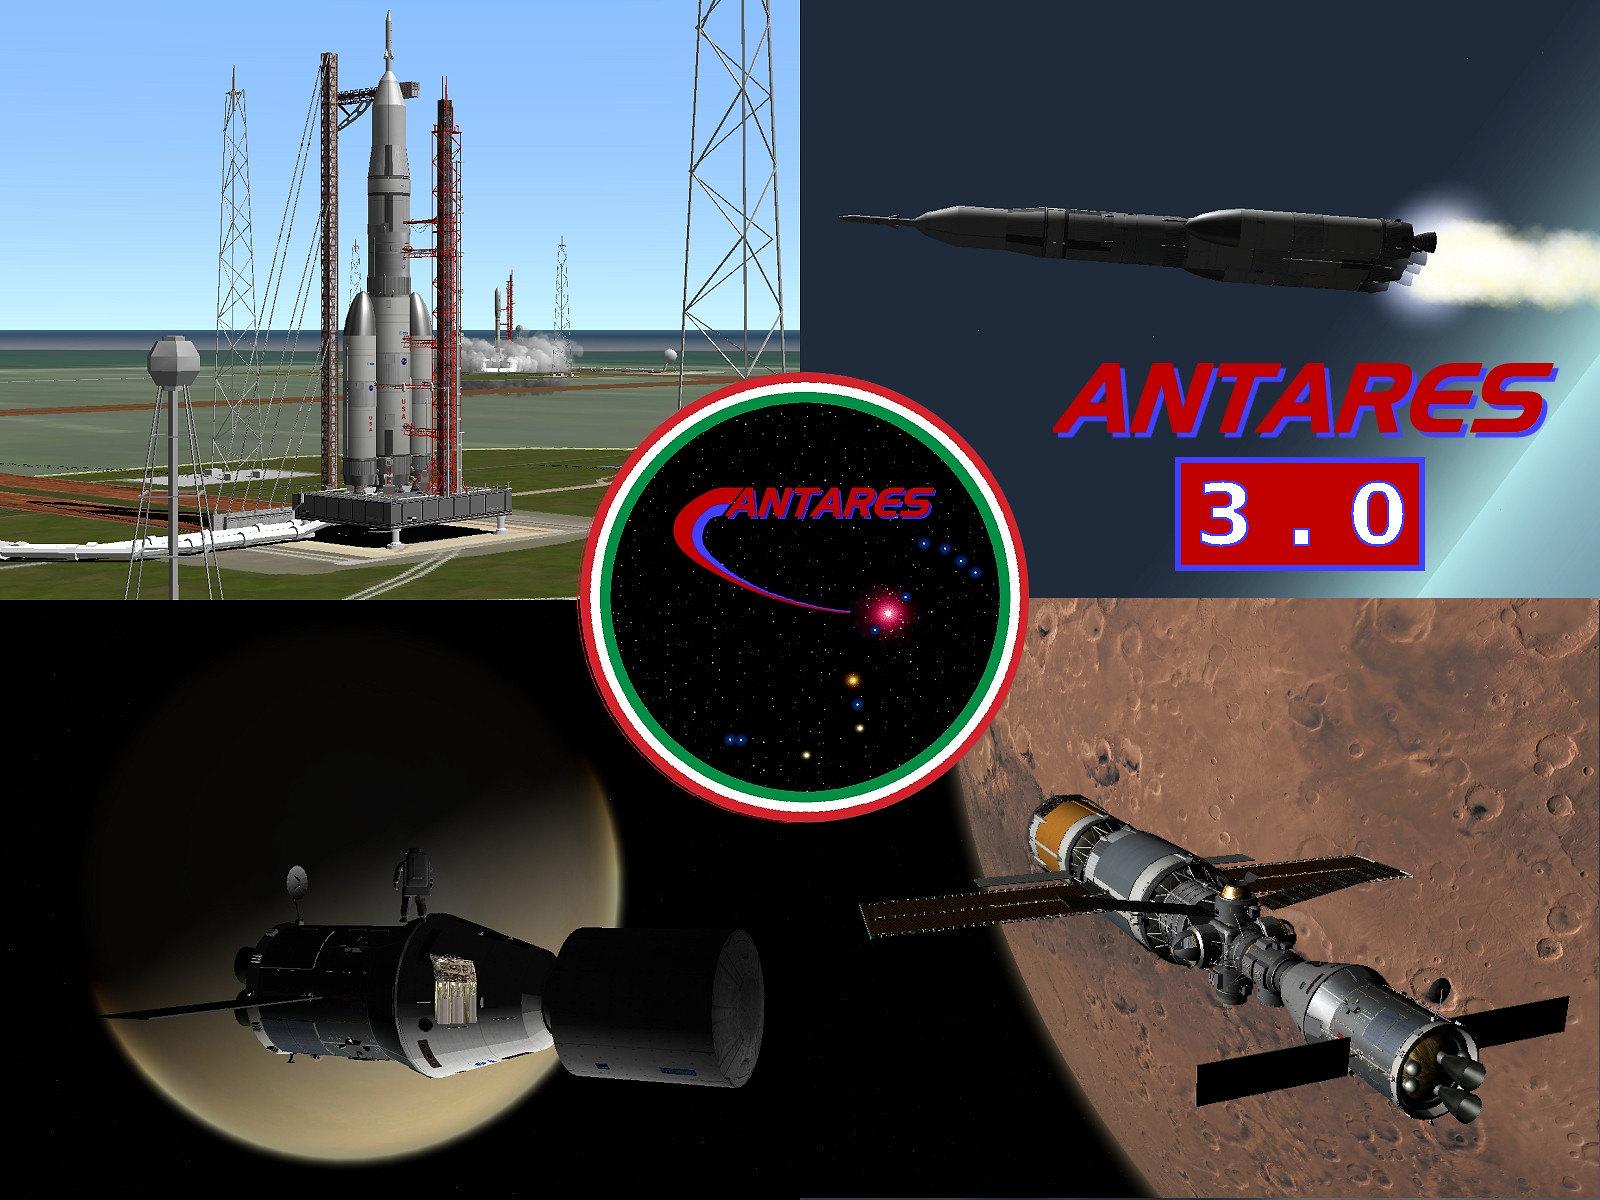 Antares 3.0 - Pagina 20 49888596772_fbf2acdfeb_h